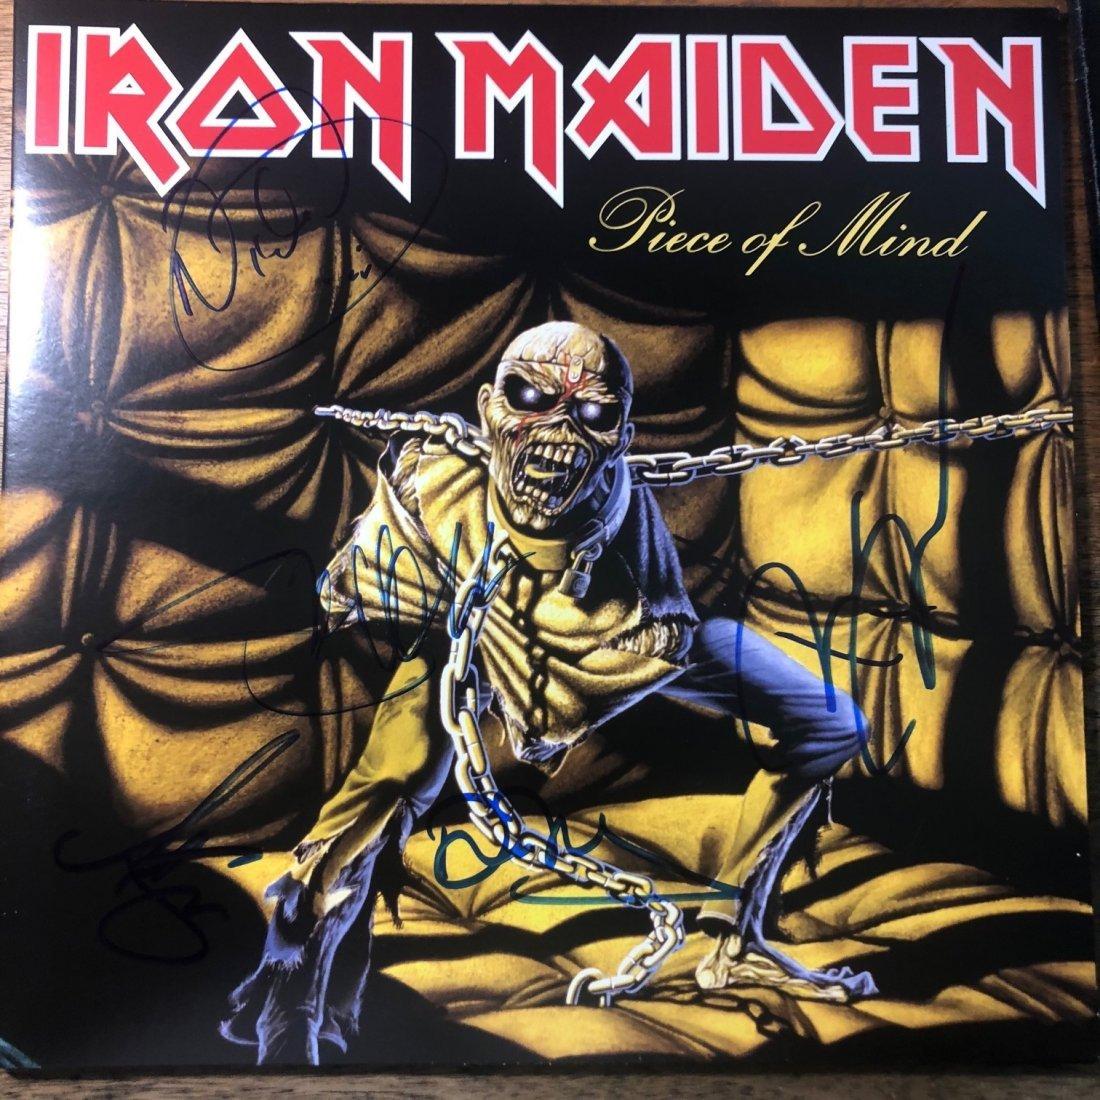 Signed Iron Maiden Piece Of Mind Album